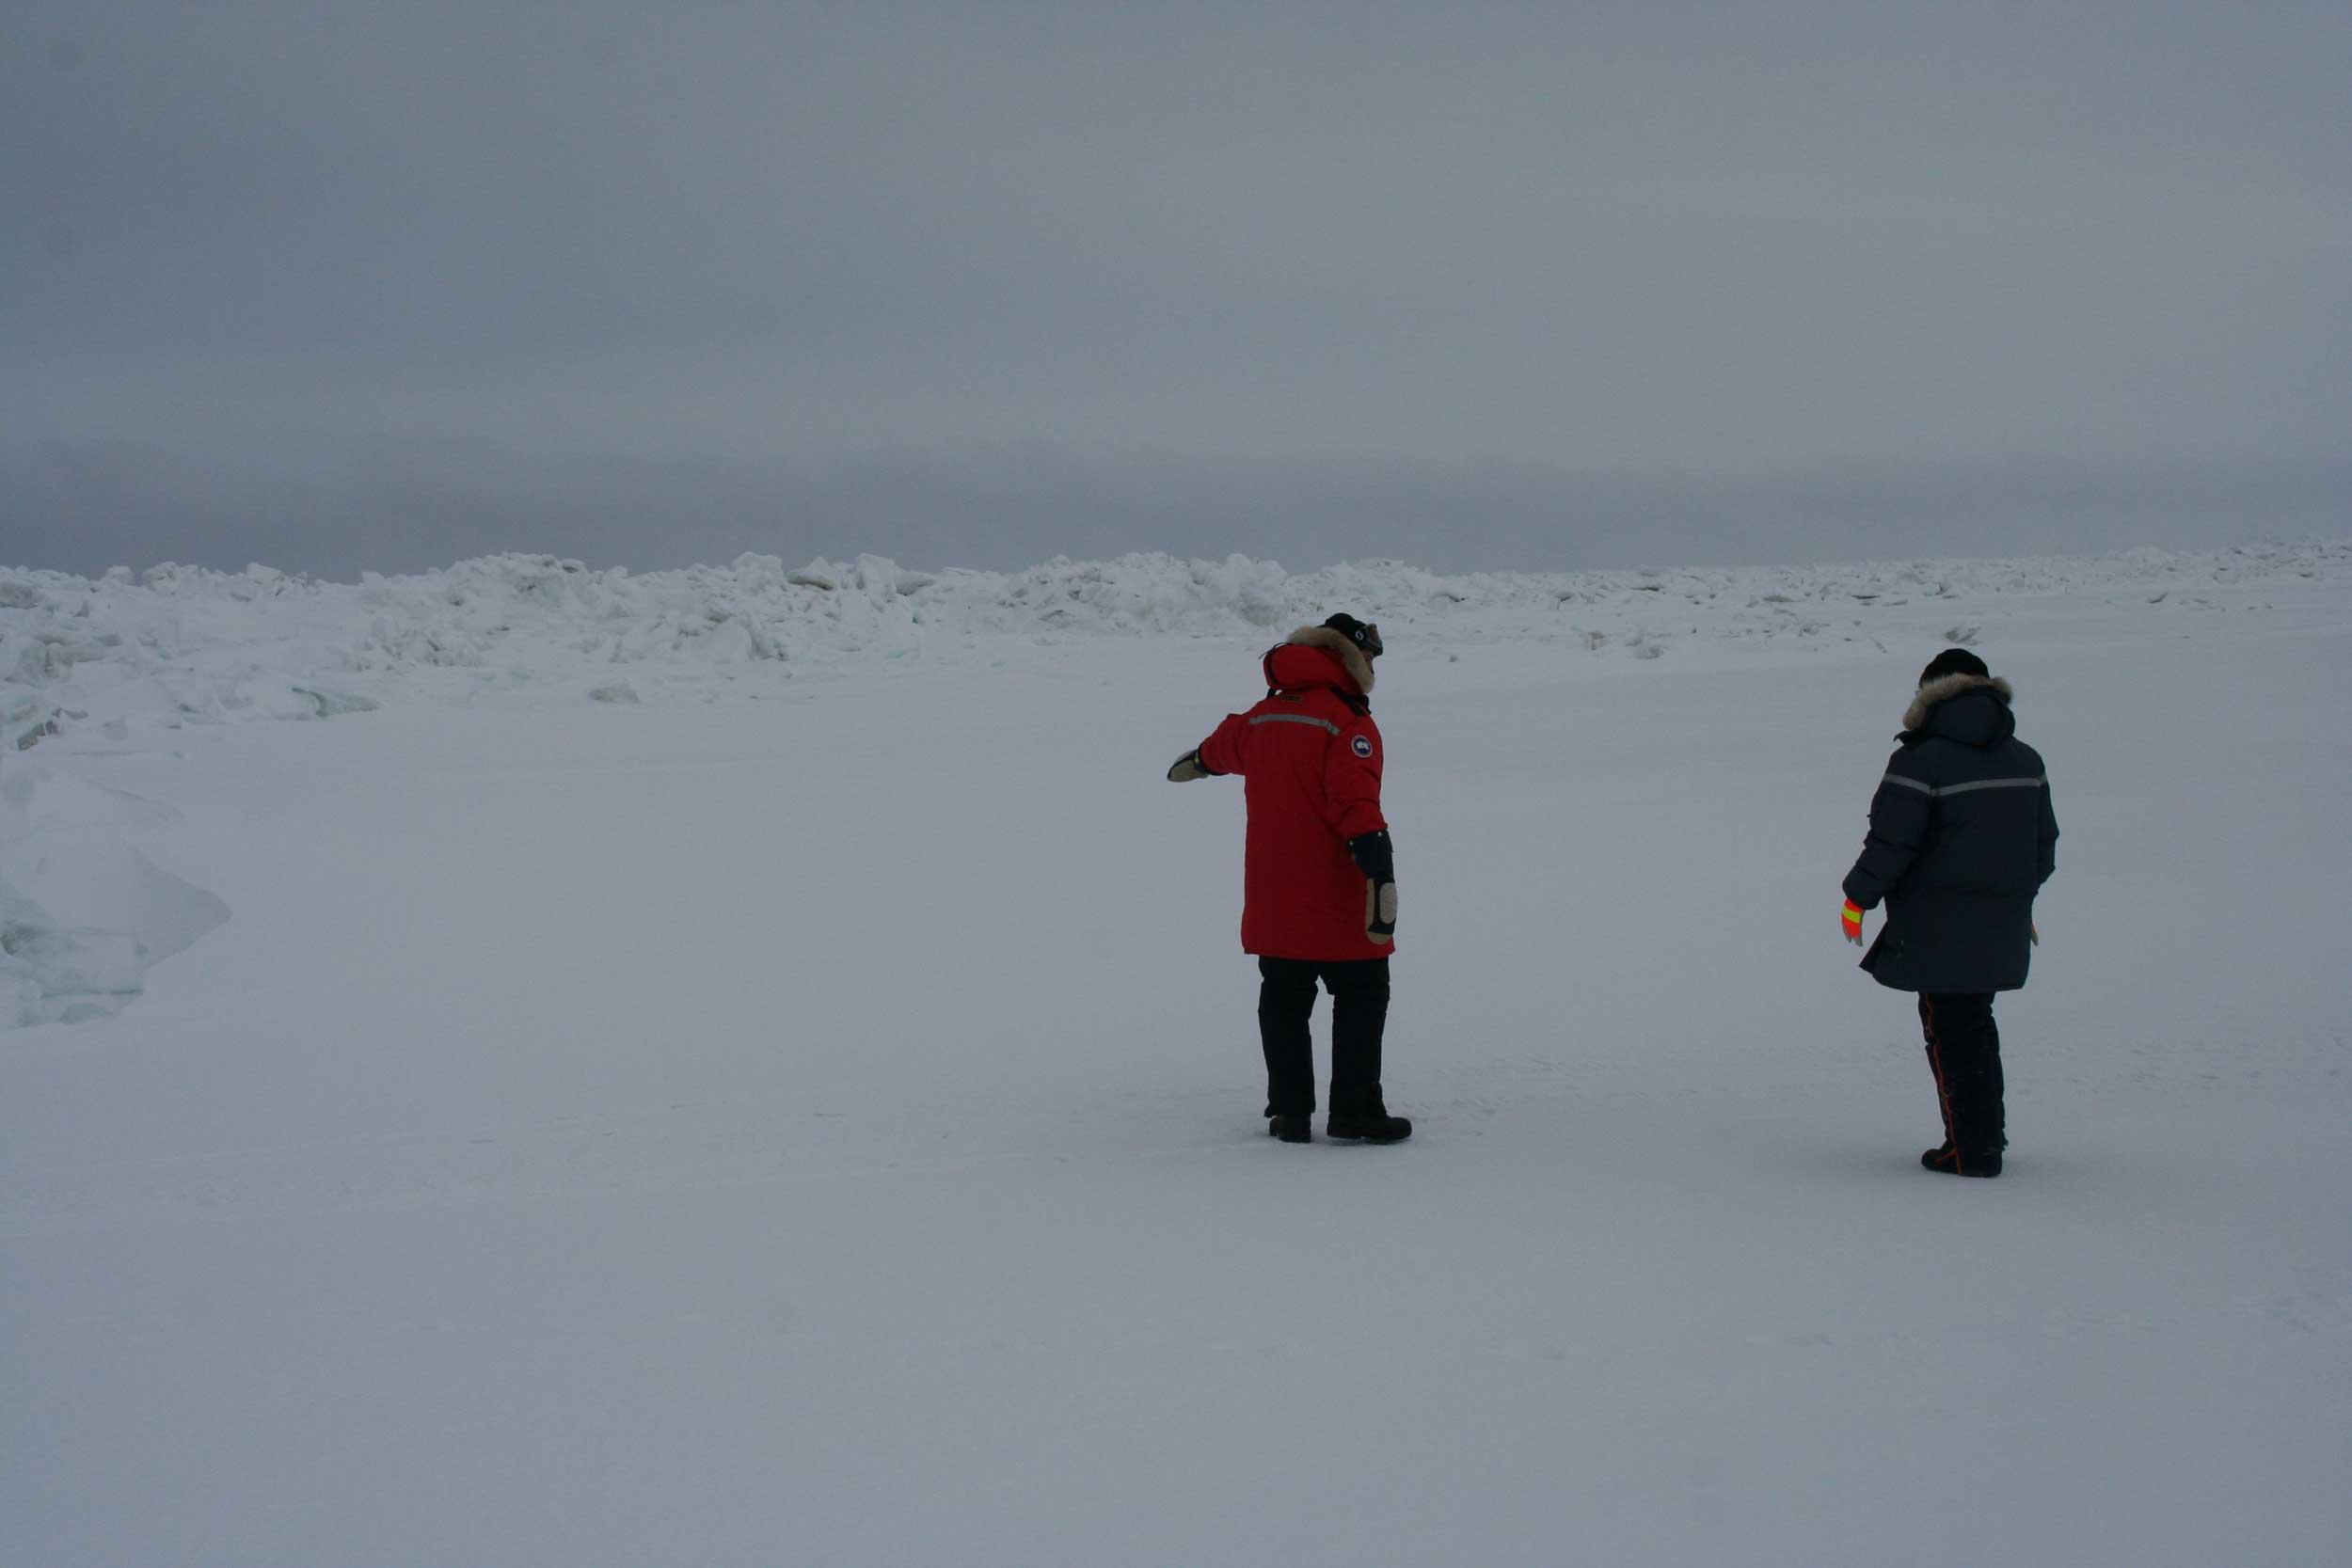 Graduate students Kyle Custard and Angela Raso exploring the Arctic sea ice. Image credit: Kerri Pratt